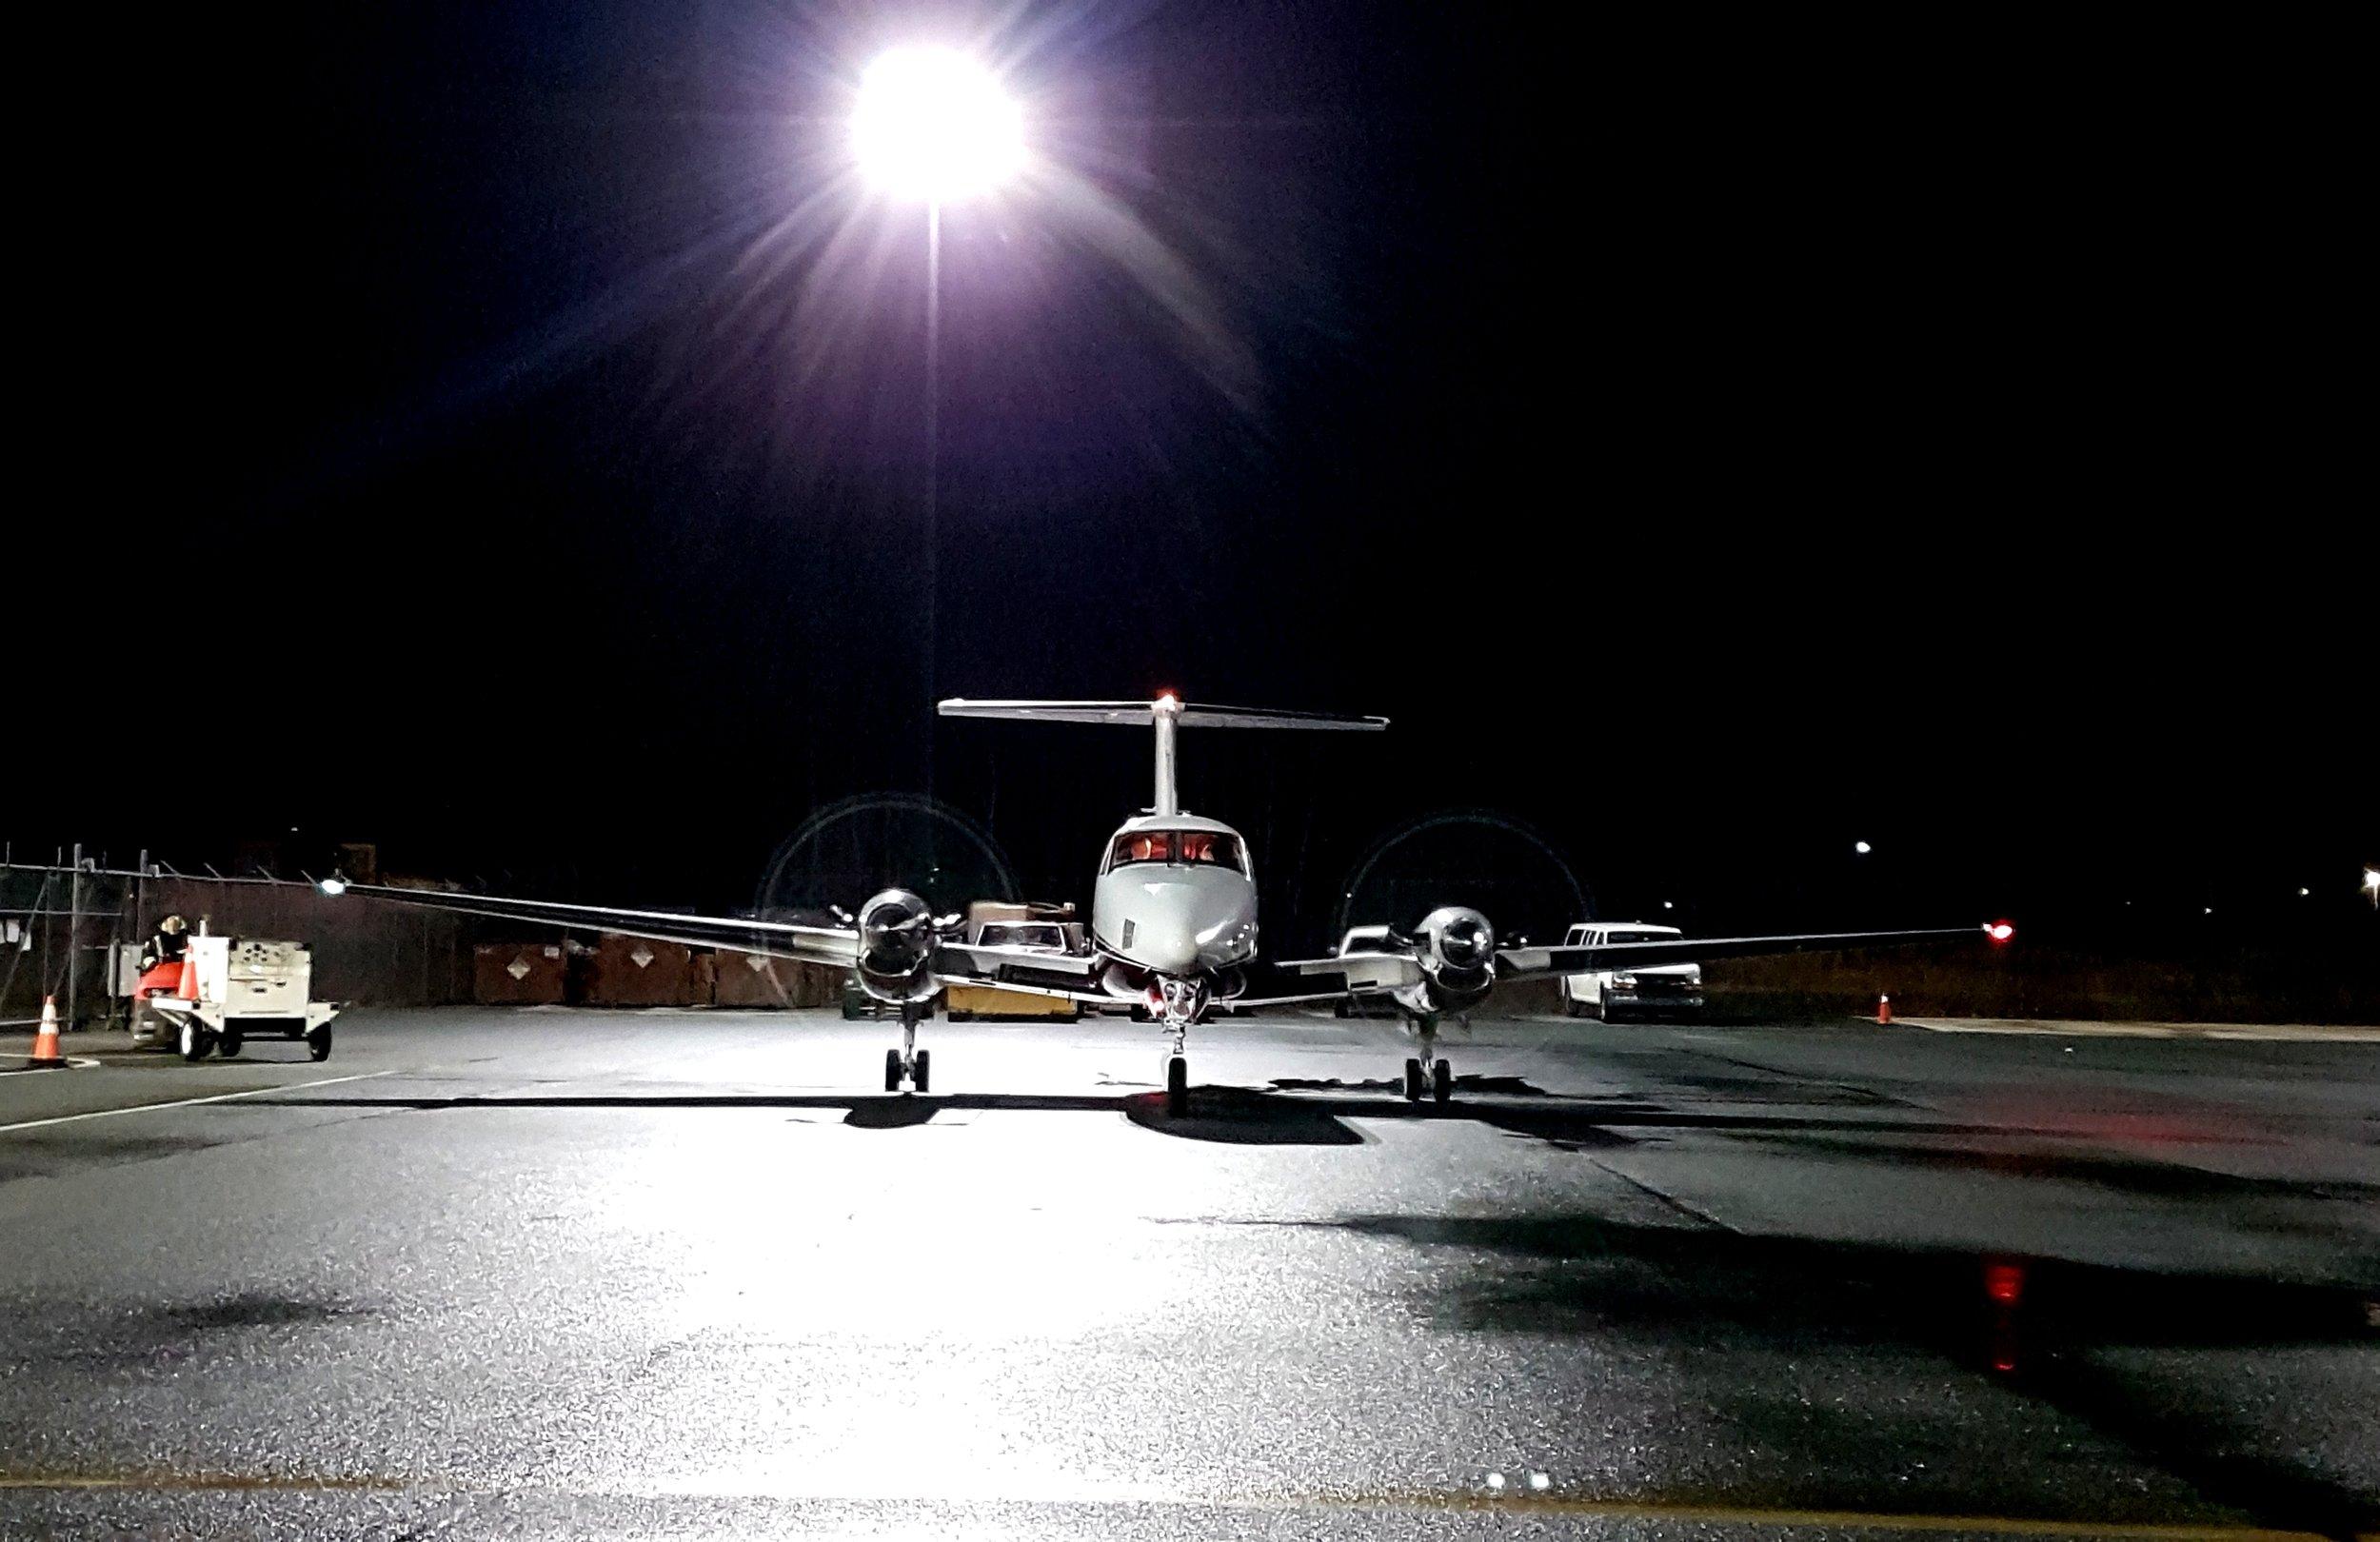 Maritime Air Charter preparing for a medevac charter